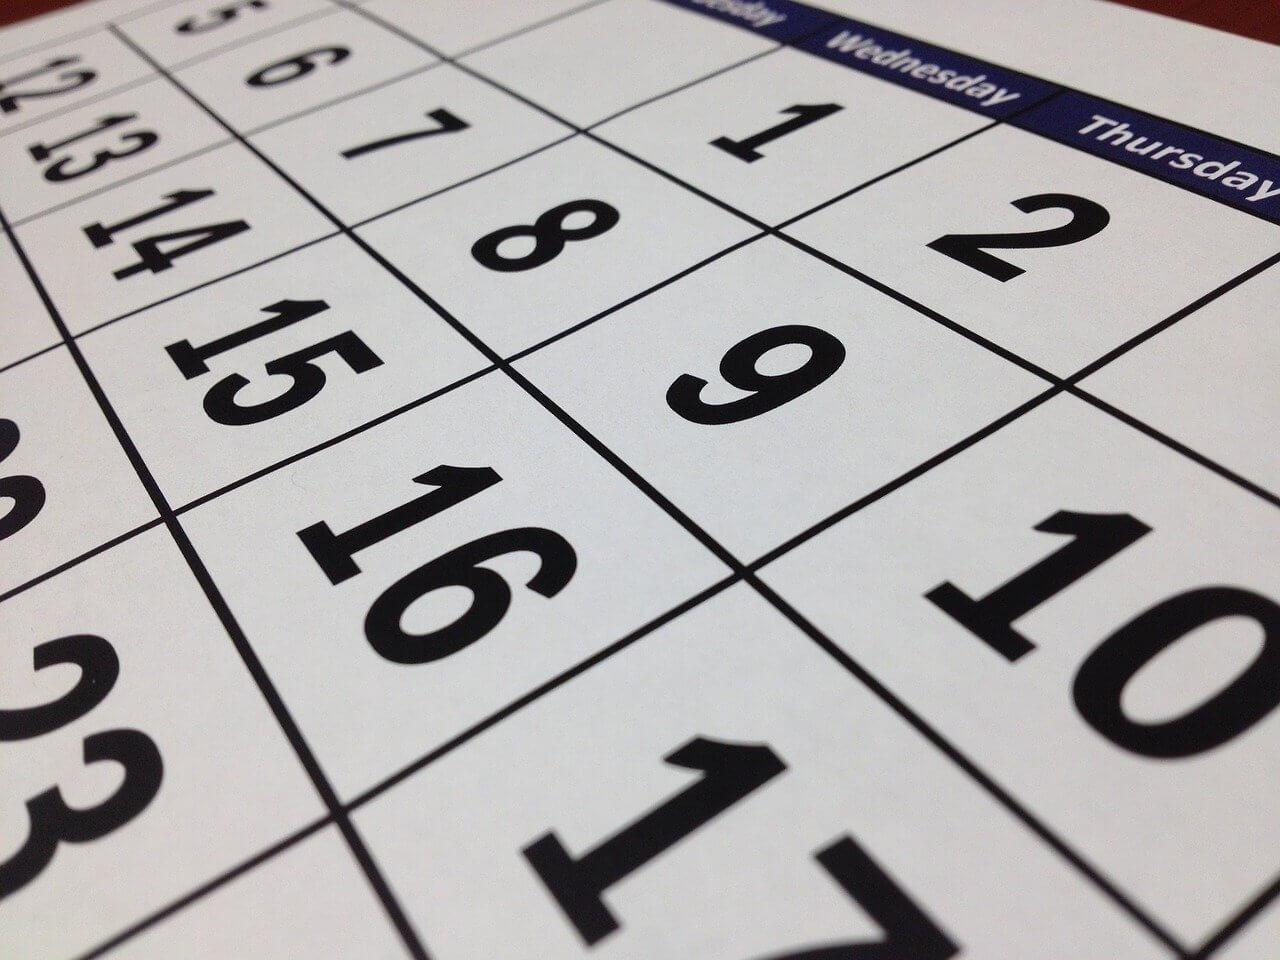 postpone, put off, push back – 「延期する」という意味の英語表現